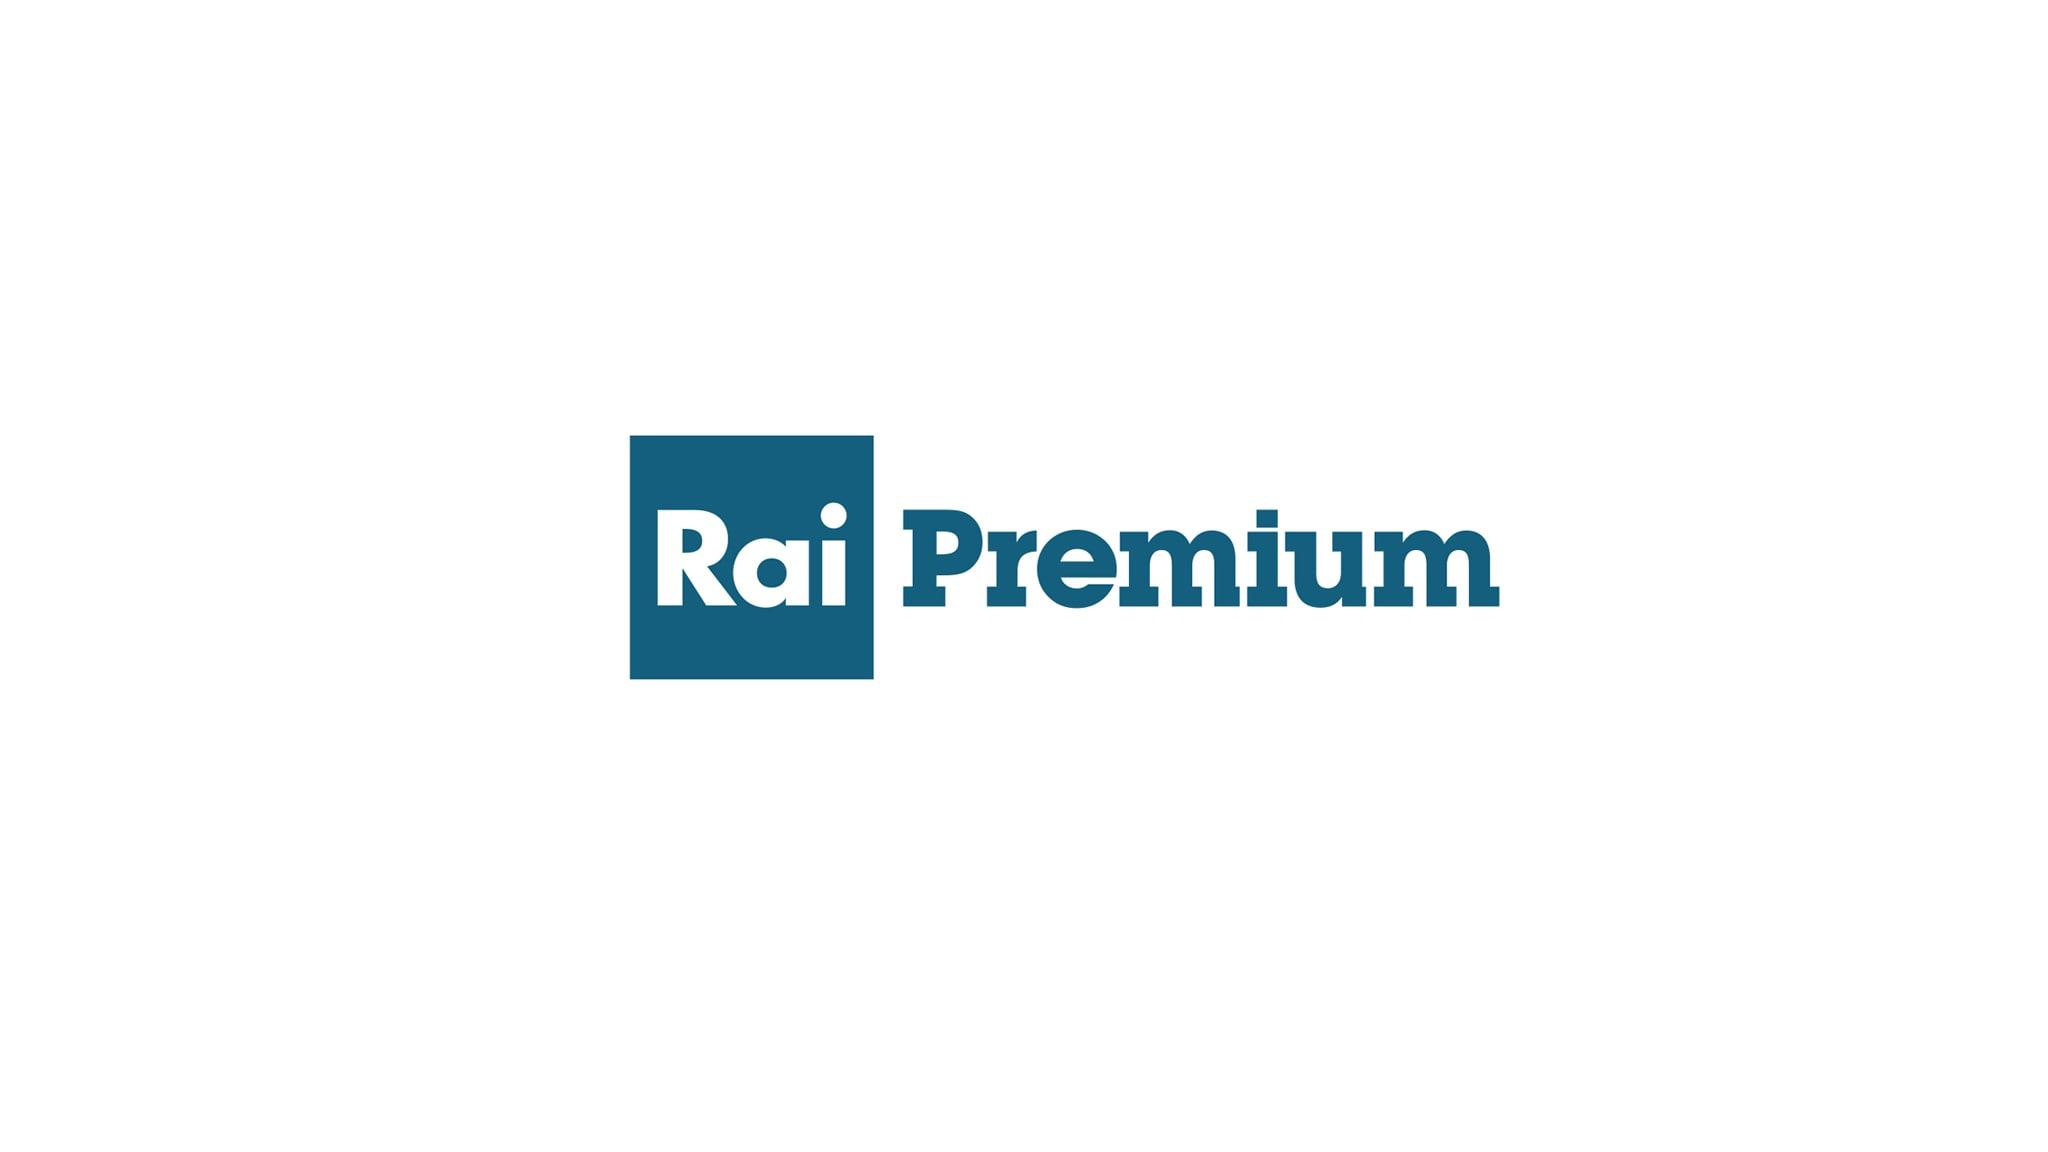 guida tv Rai Premium pomeriggio, oggi su Rai Premium pomeriggio.